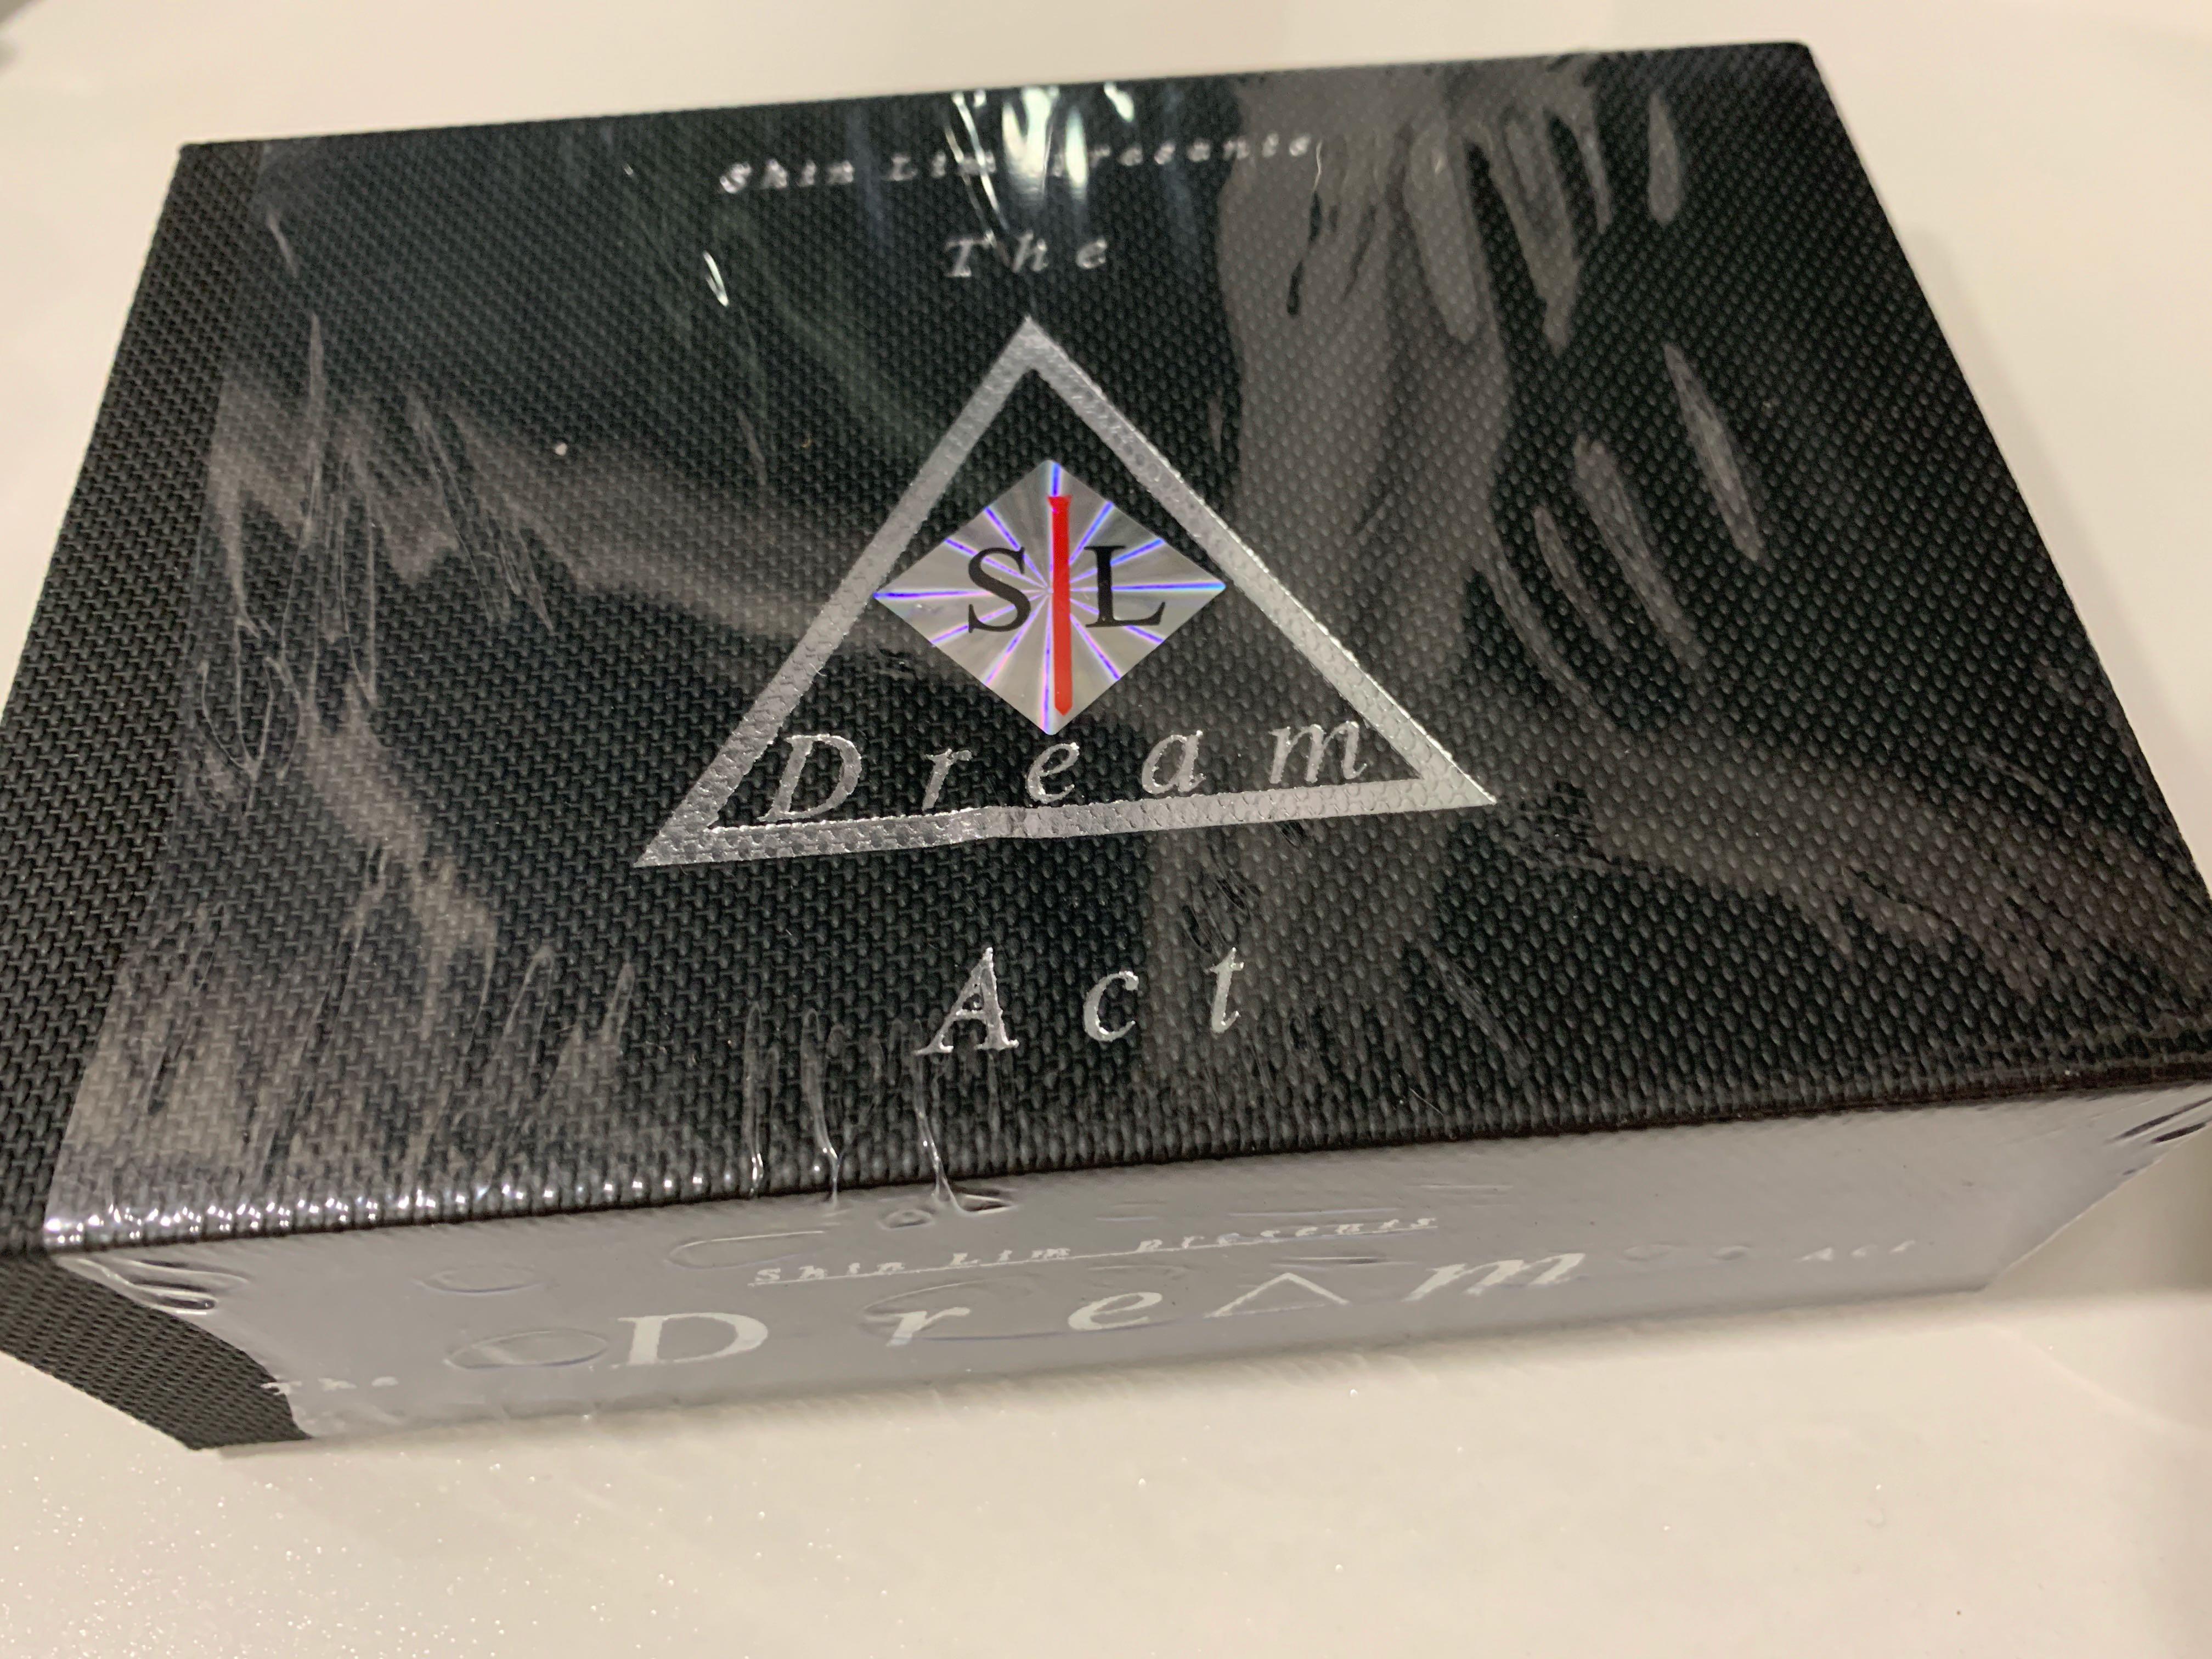 Dream act - Shin Lim magic trick